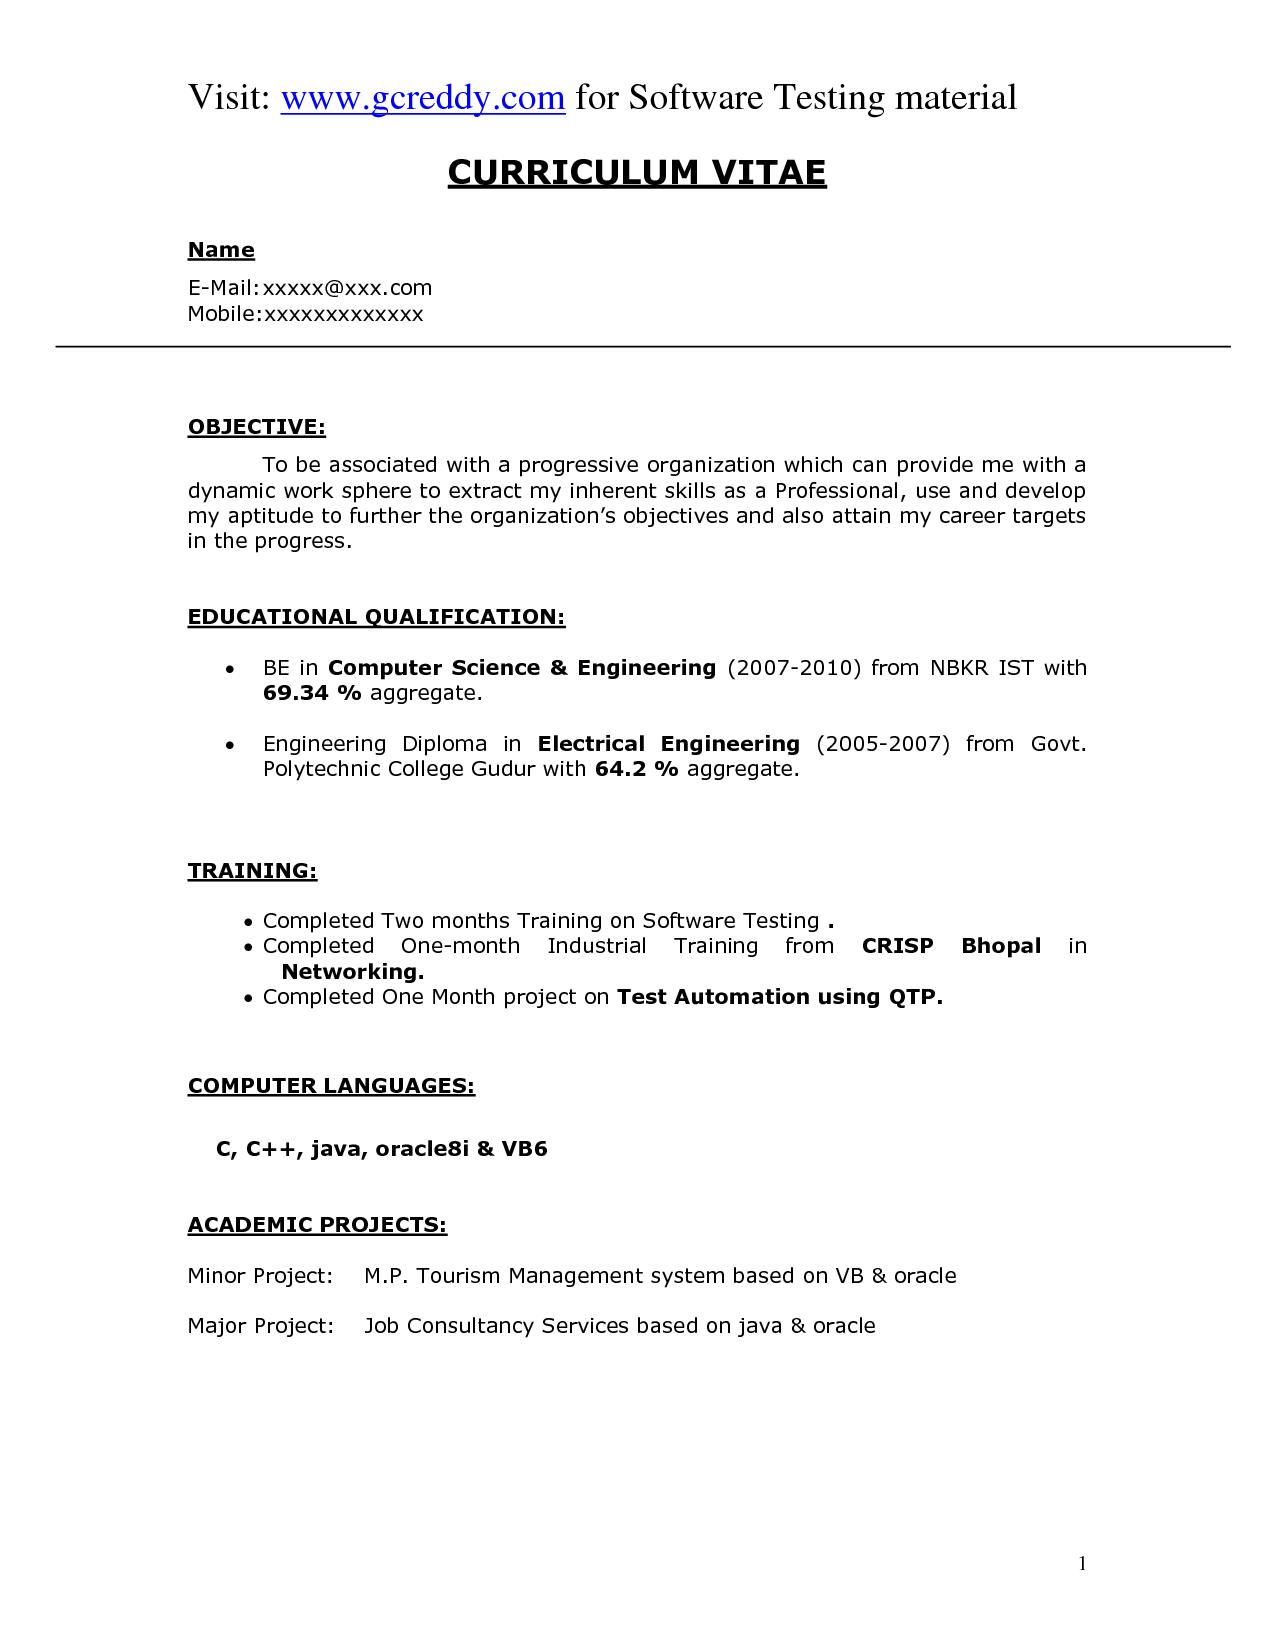 Software Manager Resume Cover Letter Samples Project Break